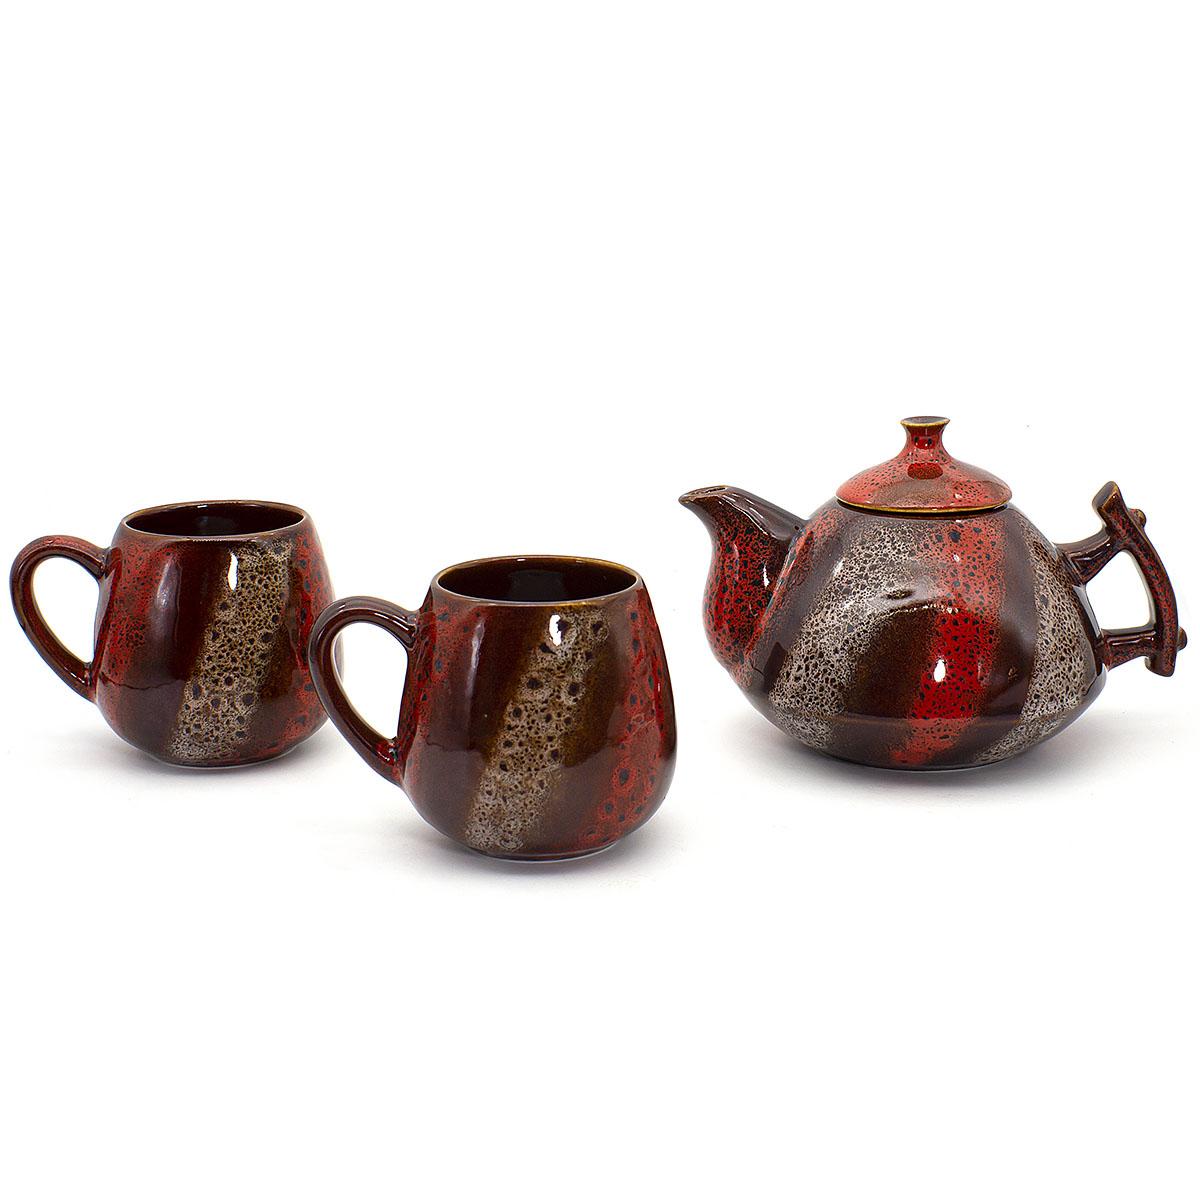 Набор Малиновый щербет: 2 чашки 350 мл и чайник 800 мл